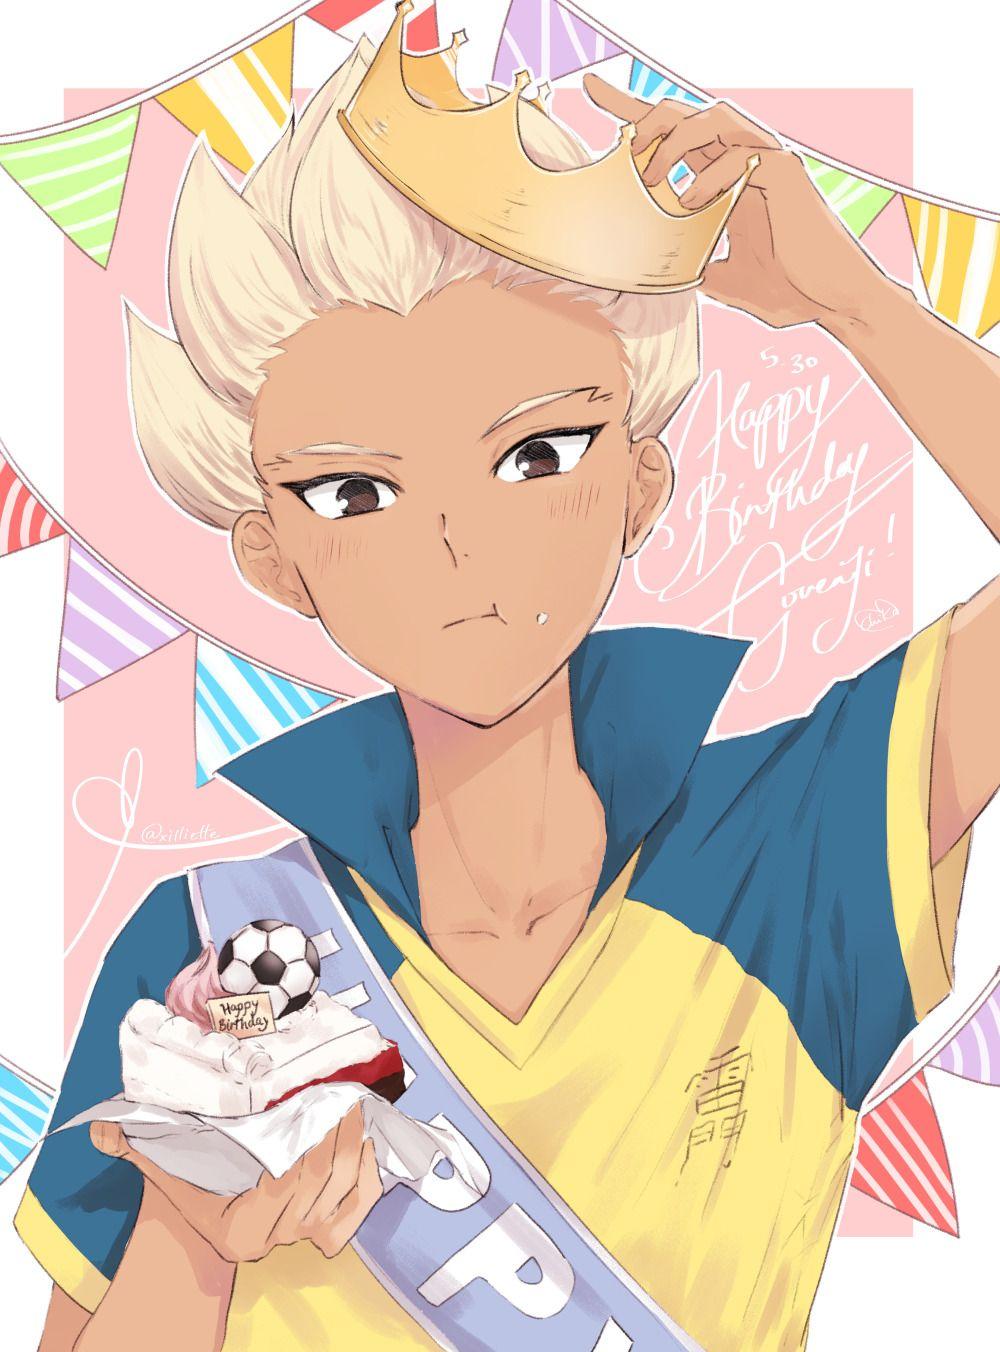 Pin by Joud on Gouenji Shuuya Anime, Shuya, Eleventh